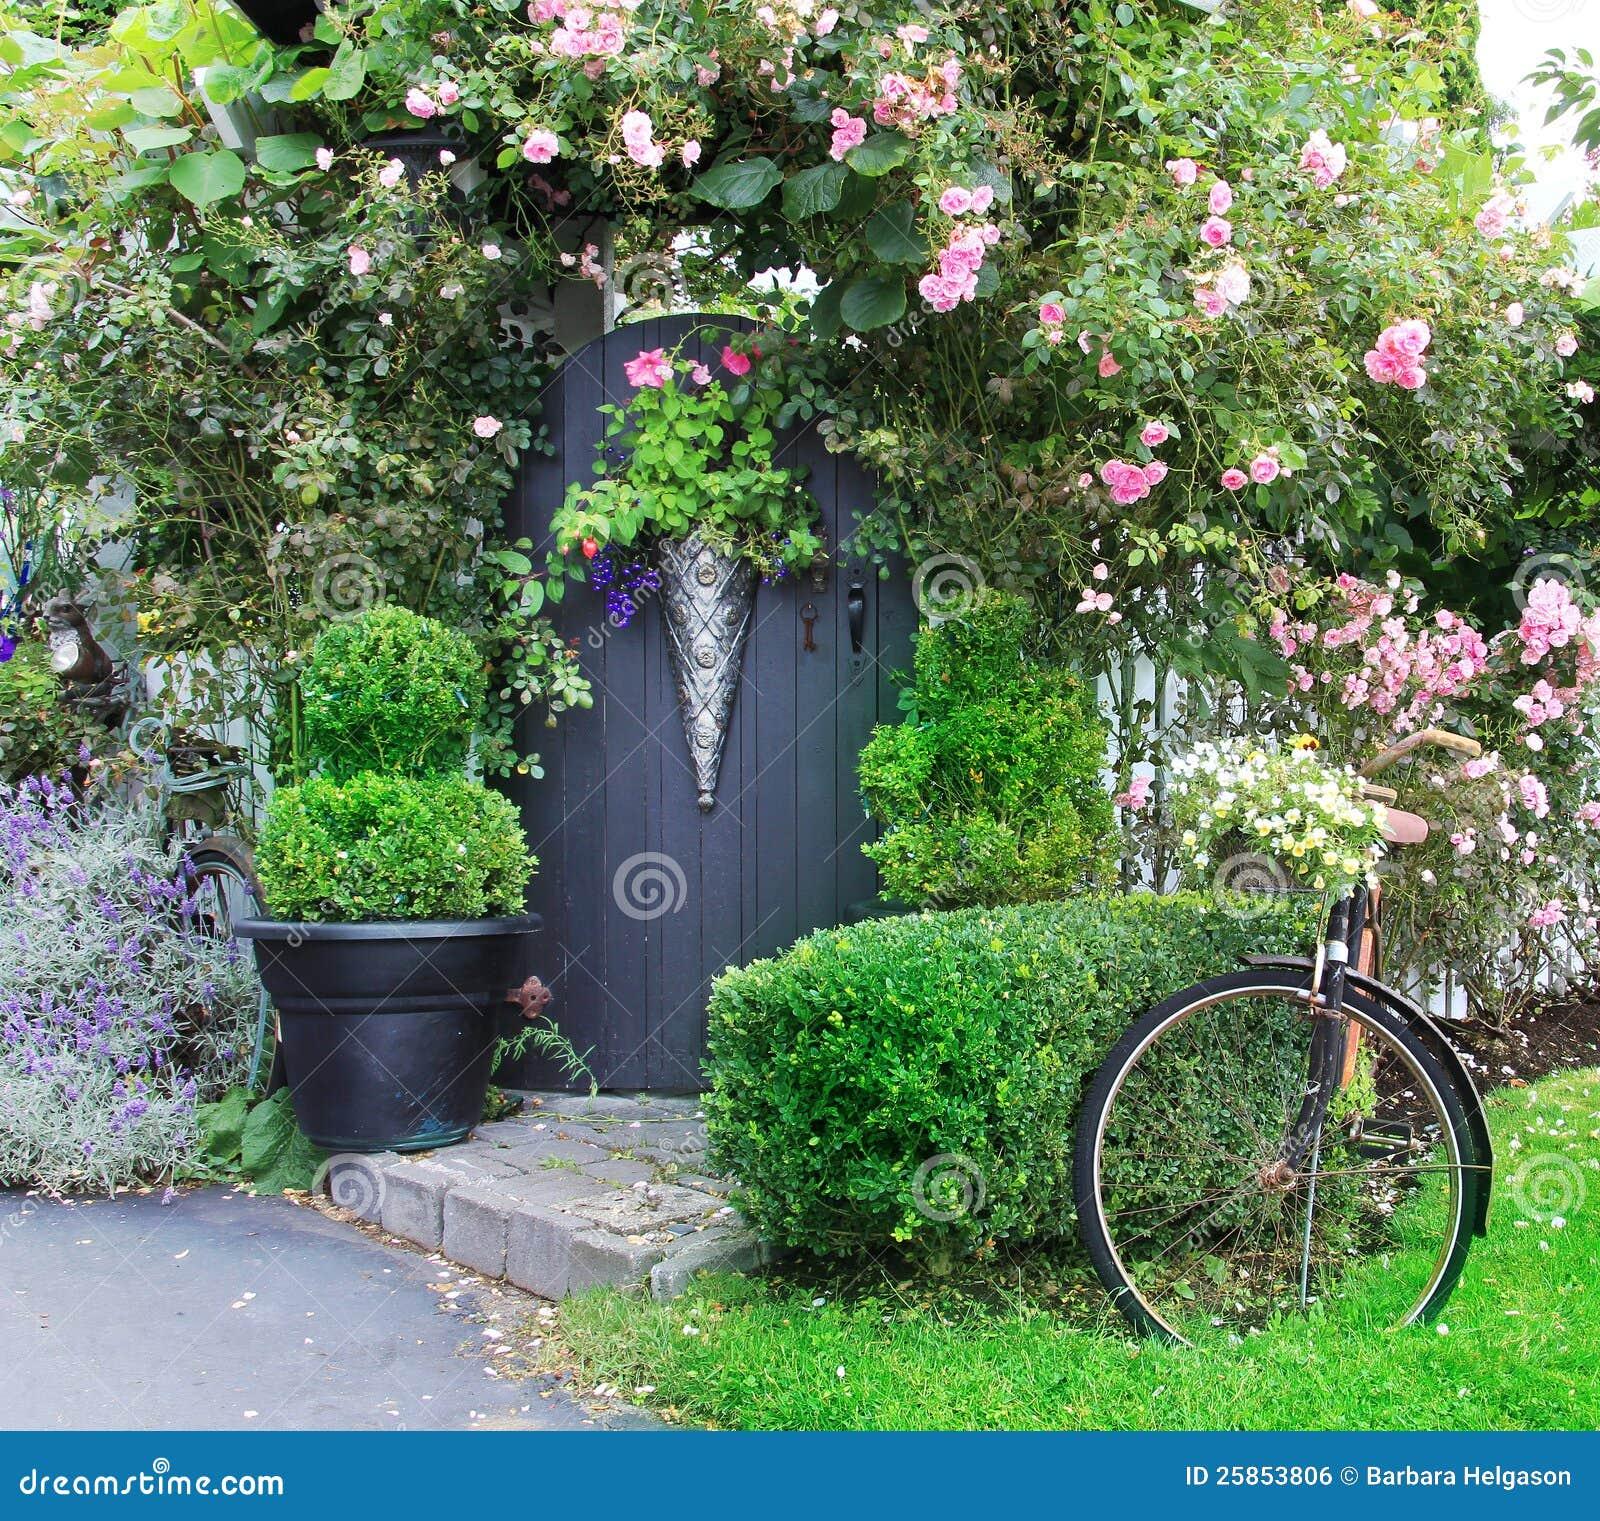 Petite porte de jardin avec du charme photo stock image du bicyclette roses 25853806 - Porte de jardin ...